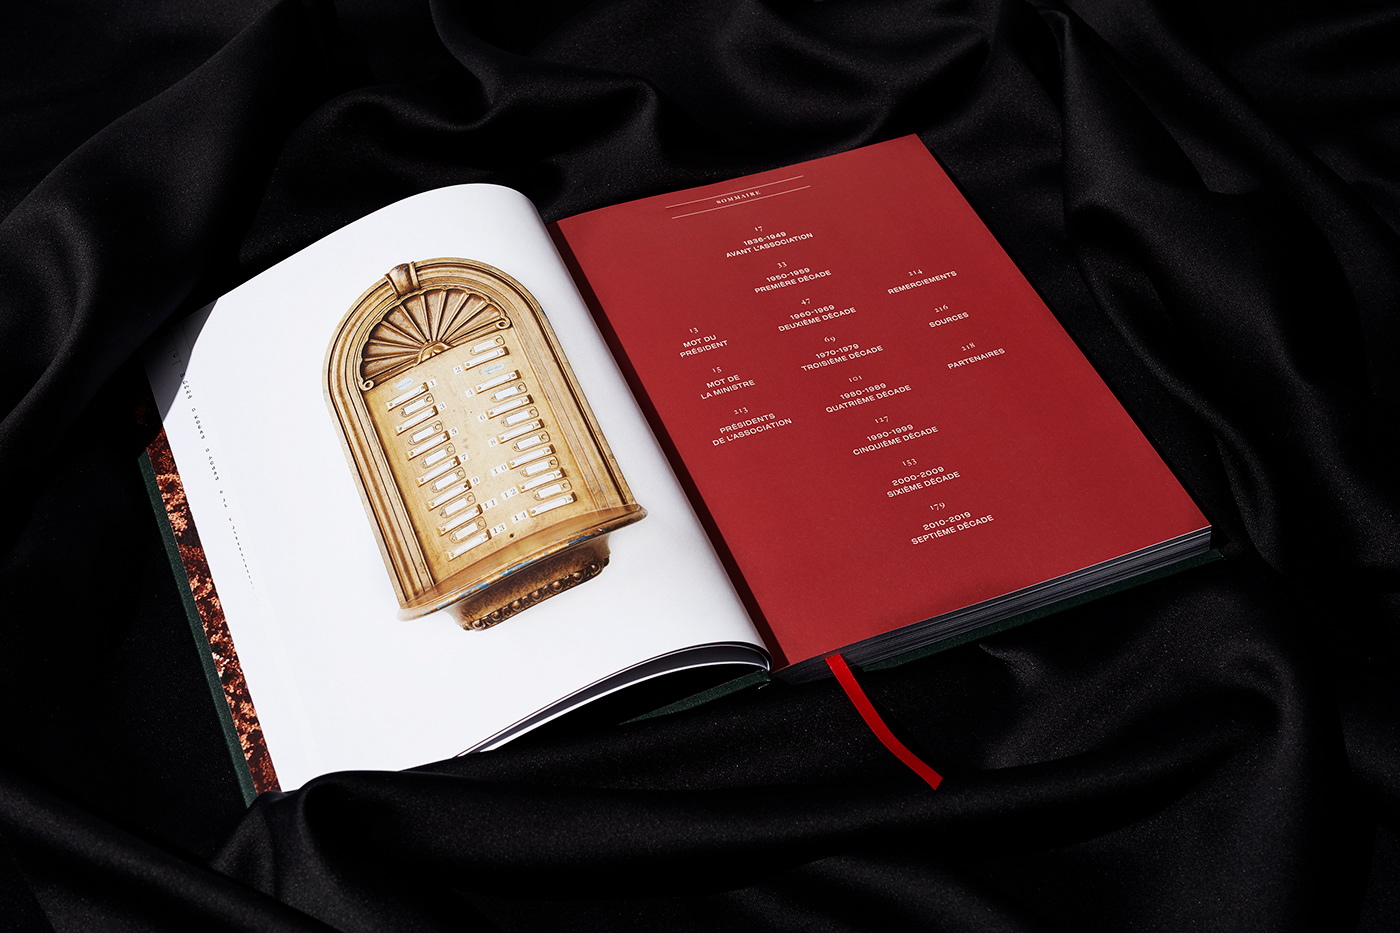 Image may contain: book, indoor and menu